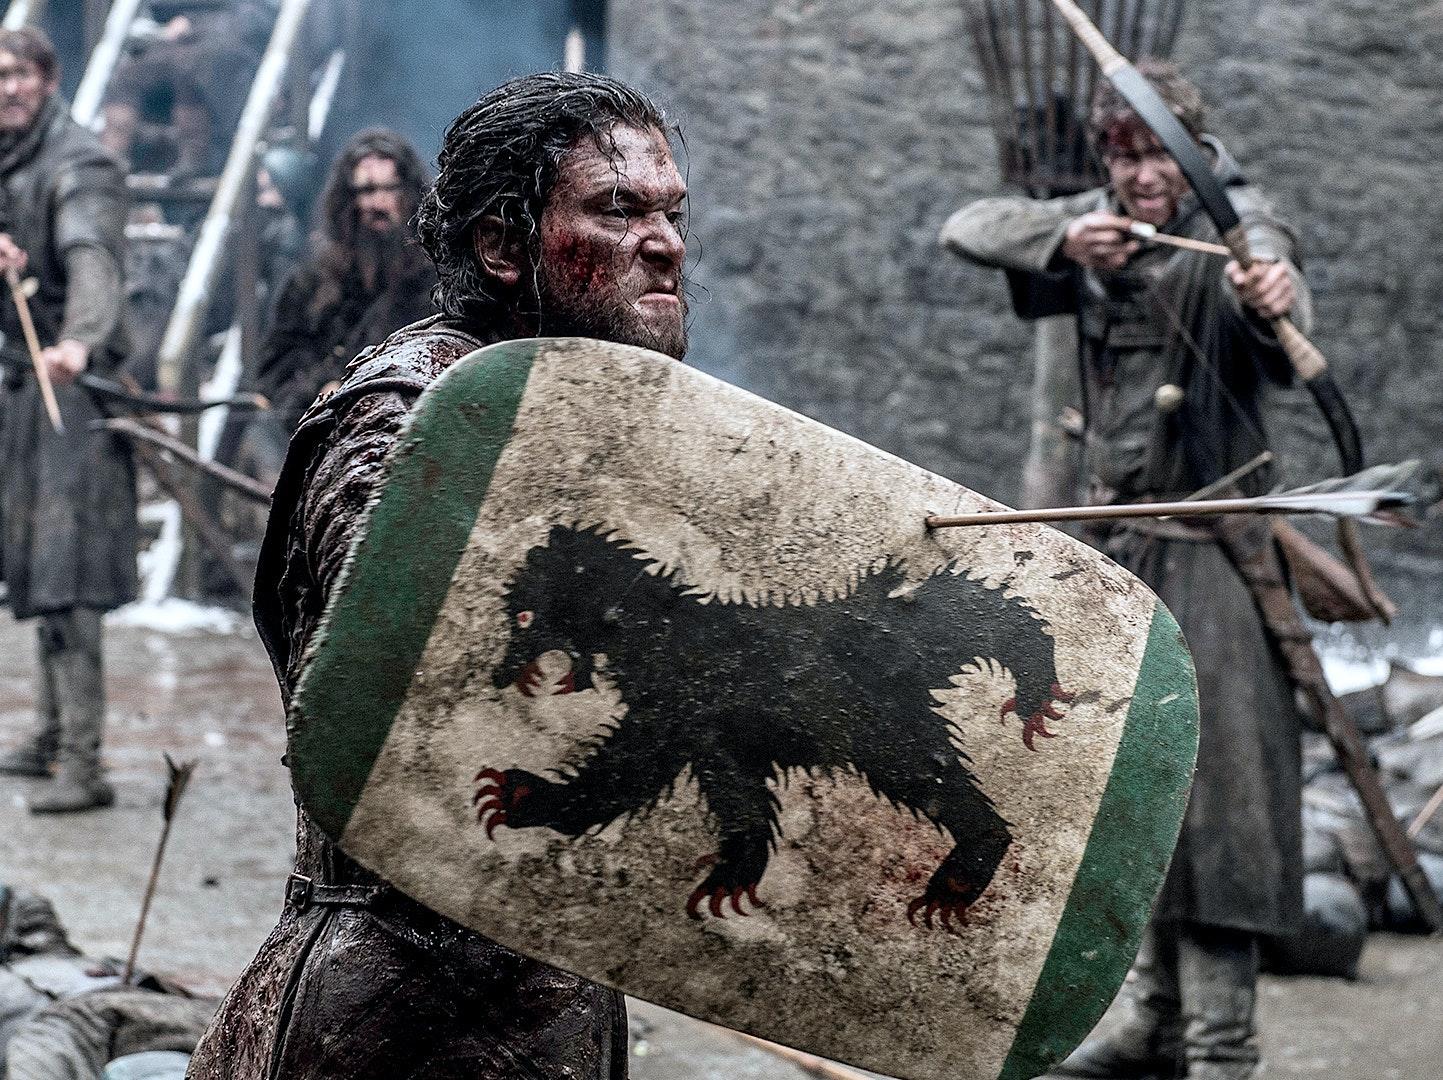 Rhaegar Targaryen Played By a Rock Star Makes Perfect Sense